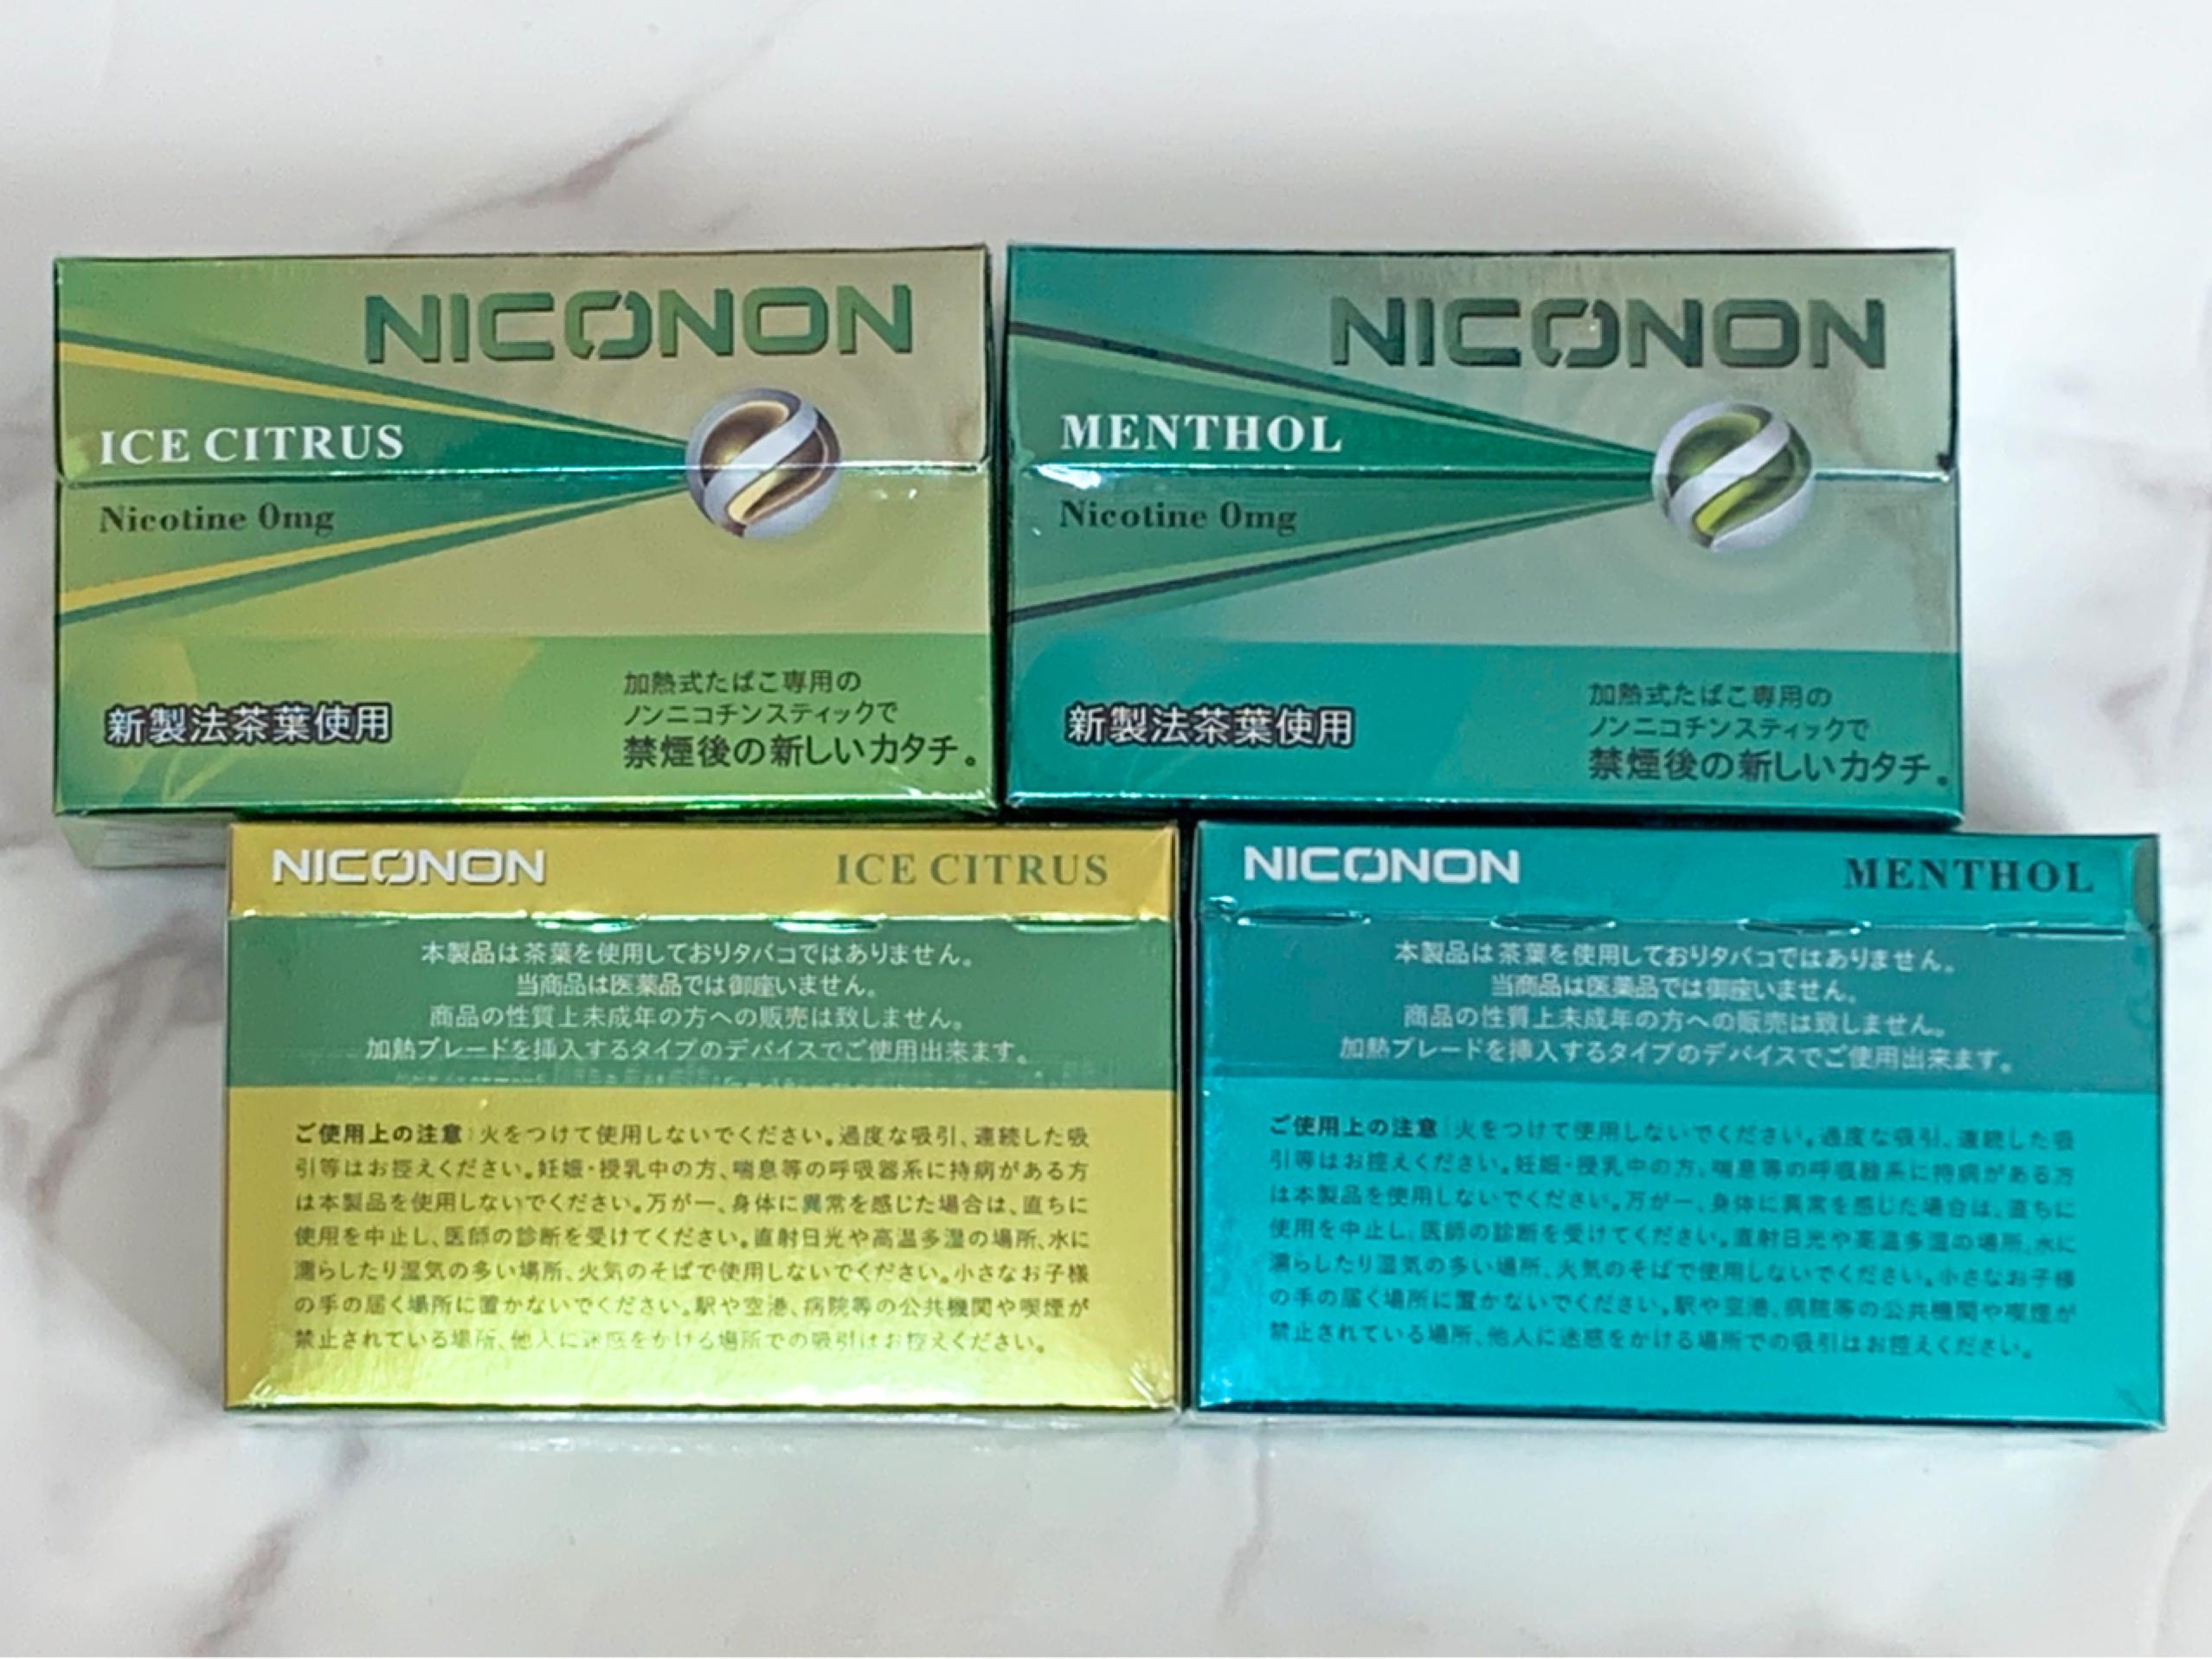 3B7ECC35 7D5B 4419 9BDB 09779CABF53E - 【レビュー】iQOS用スティック NICONON(ニコノン)は加熱式タバコの救世主となるか!?【IQOS/glo/アイコス/グロー】